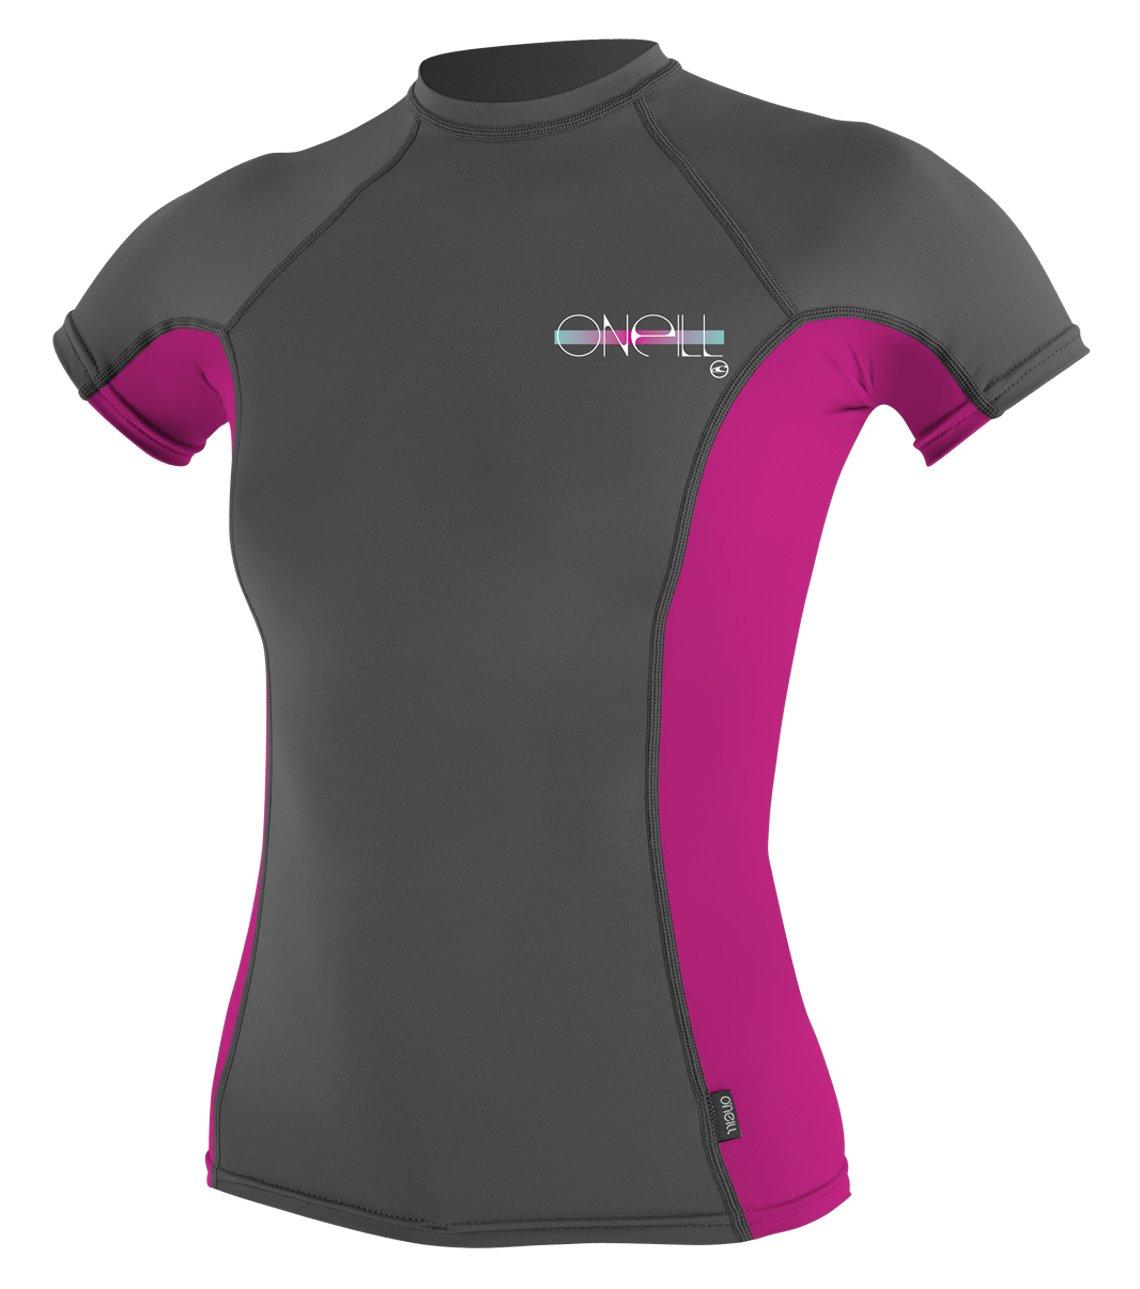 O'Neill Women's Premium Skins UPF 50+ Short Sleeve Rash Guard, Graphite/Berry/Graphite, X-Small by O'Neill Wetsuits